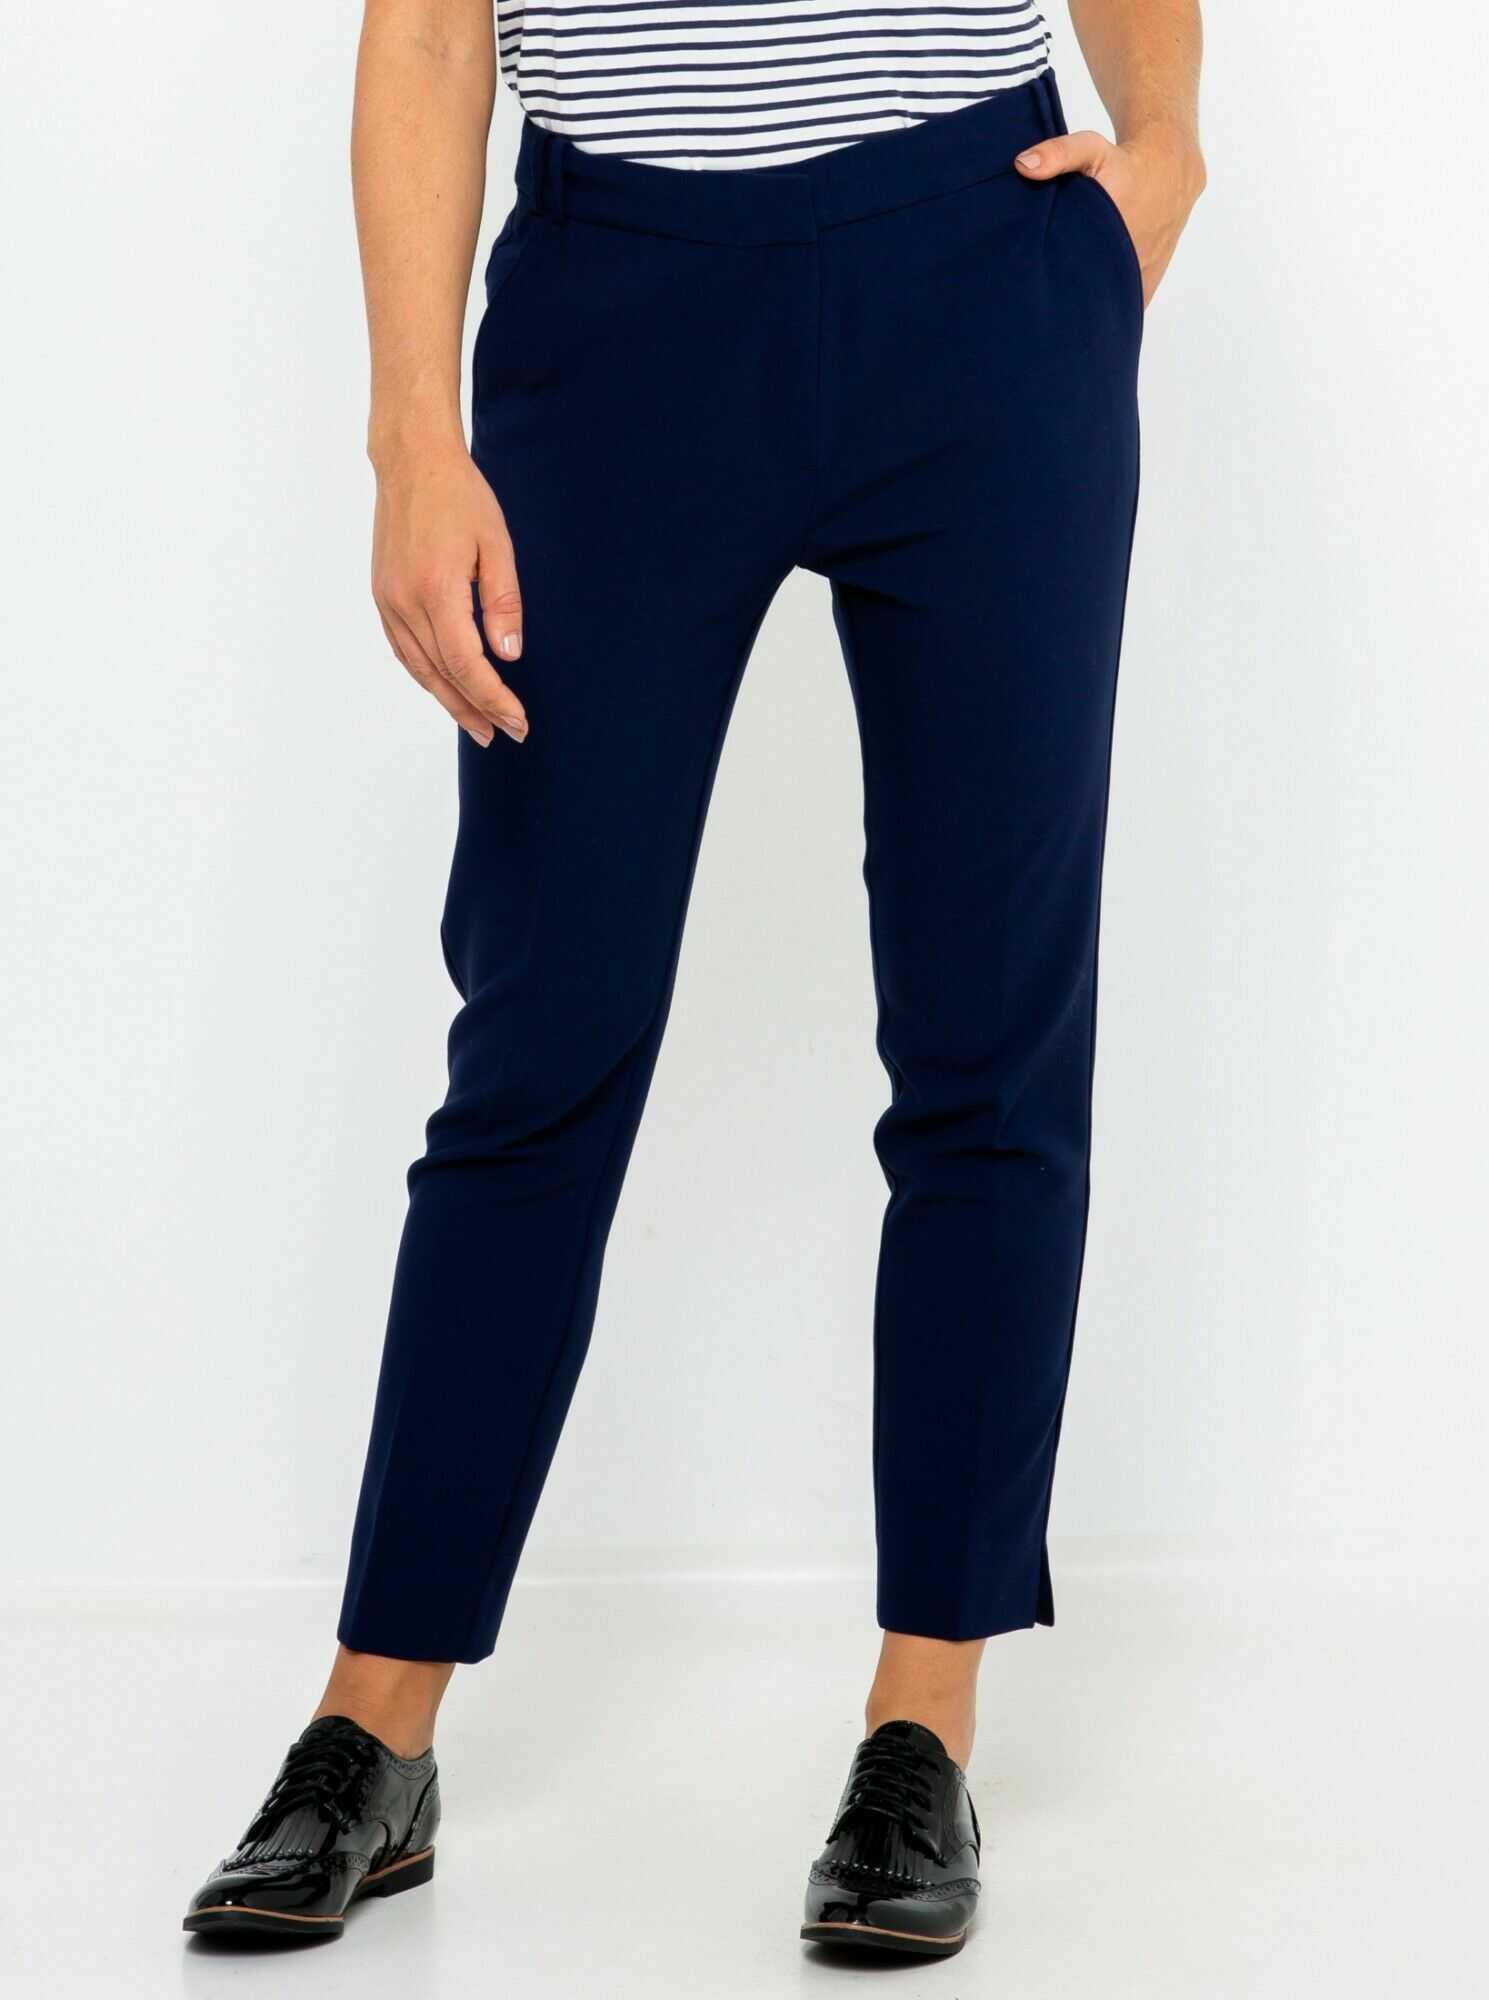 CAMAIEU niebieski skrócone chino spodnie